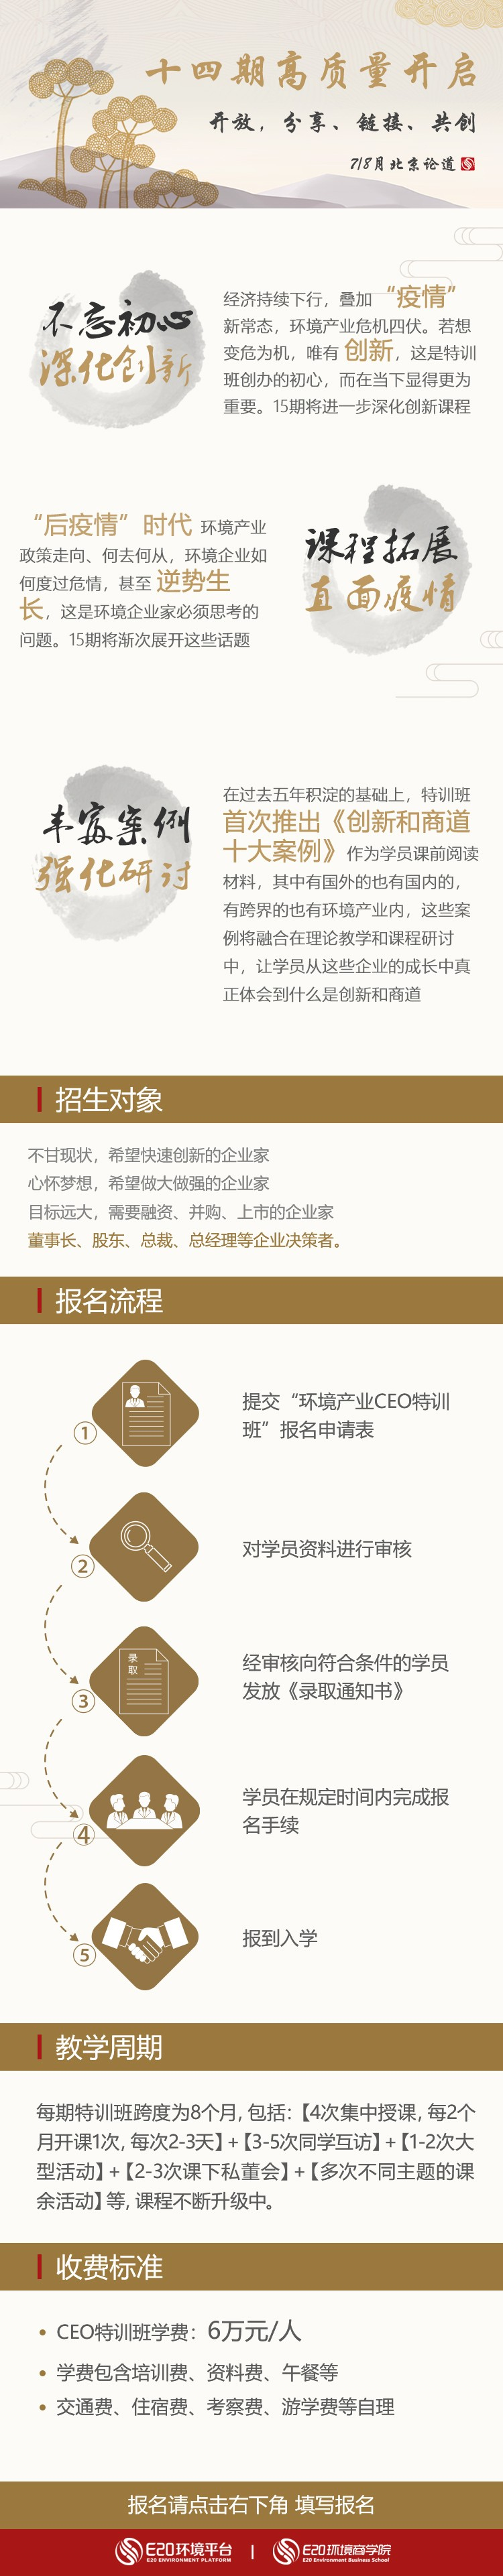 CEO特训班微官网-g.jpg